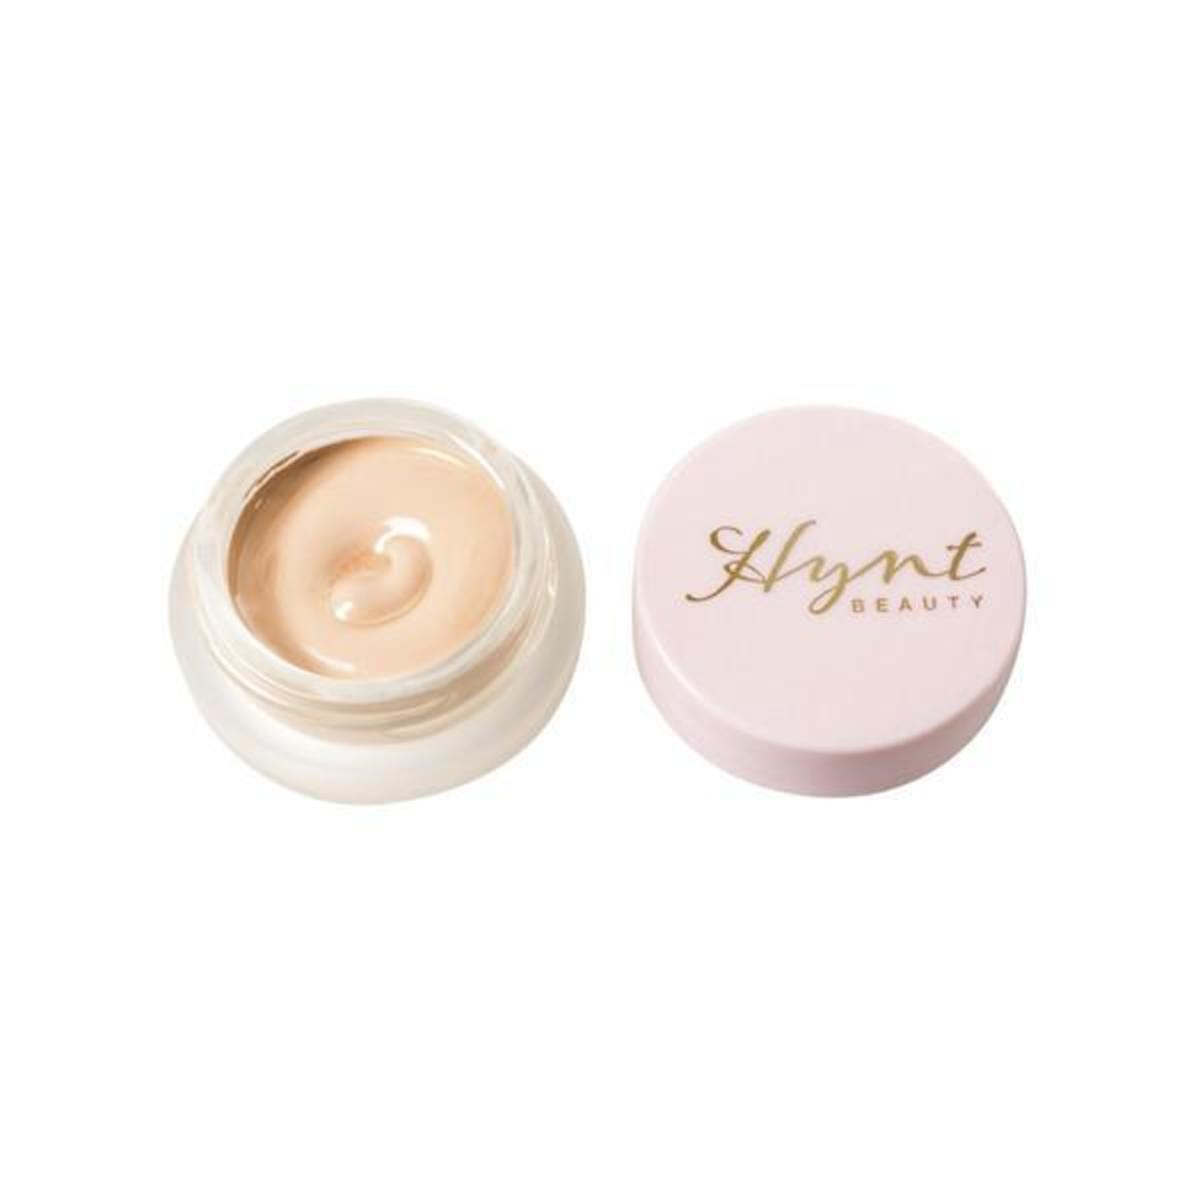 Hynt_Beauty-Duet_Perfecting_Concealers-8.5g-Fair_grande